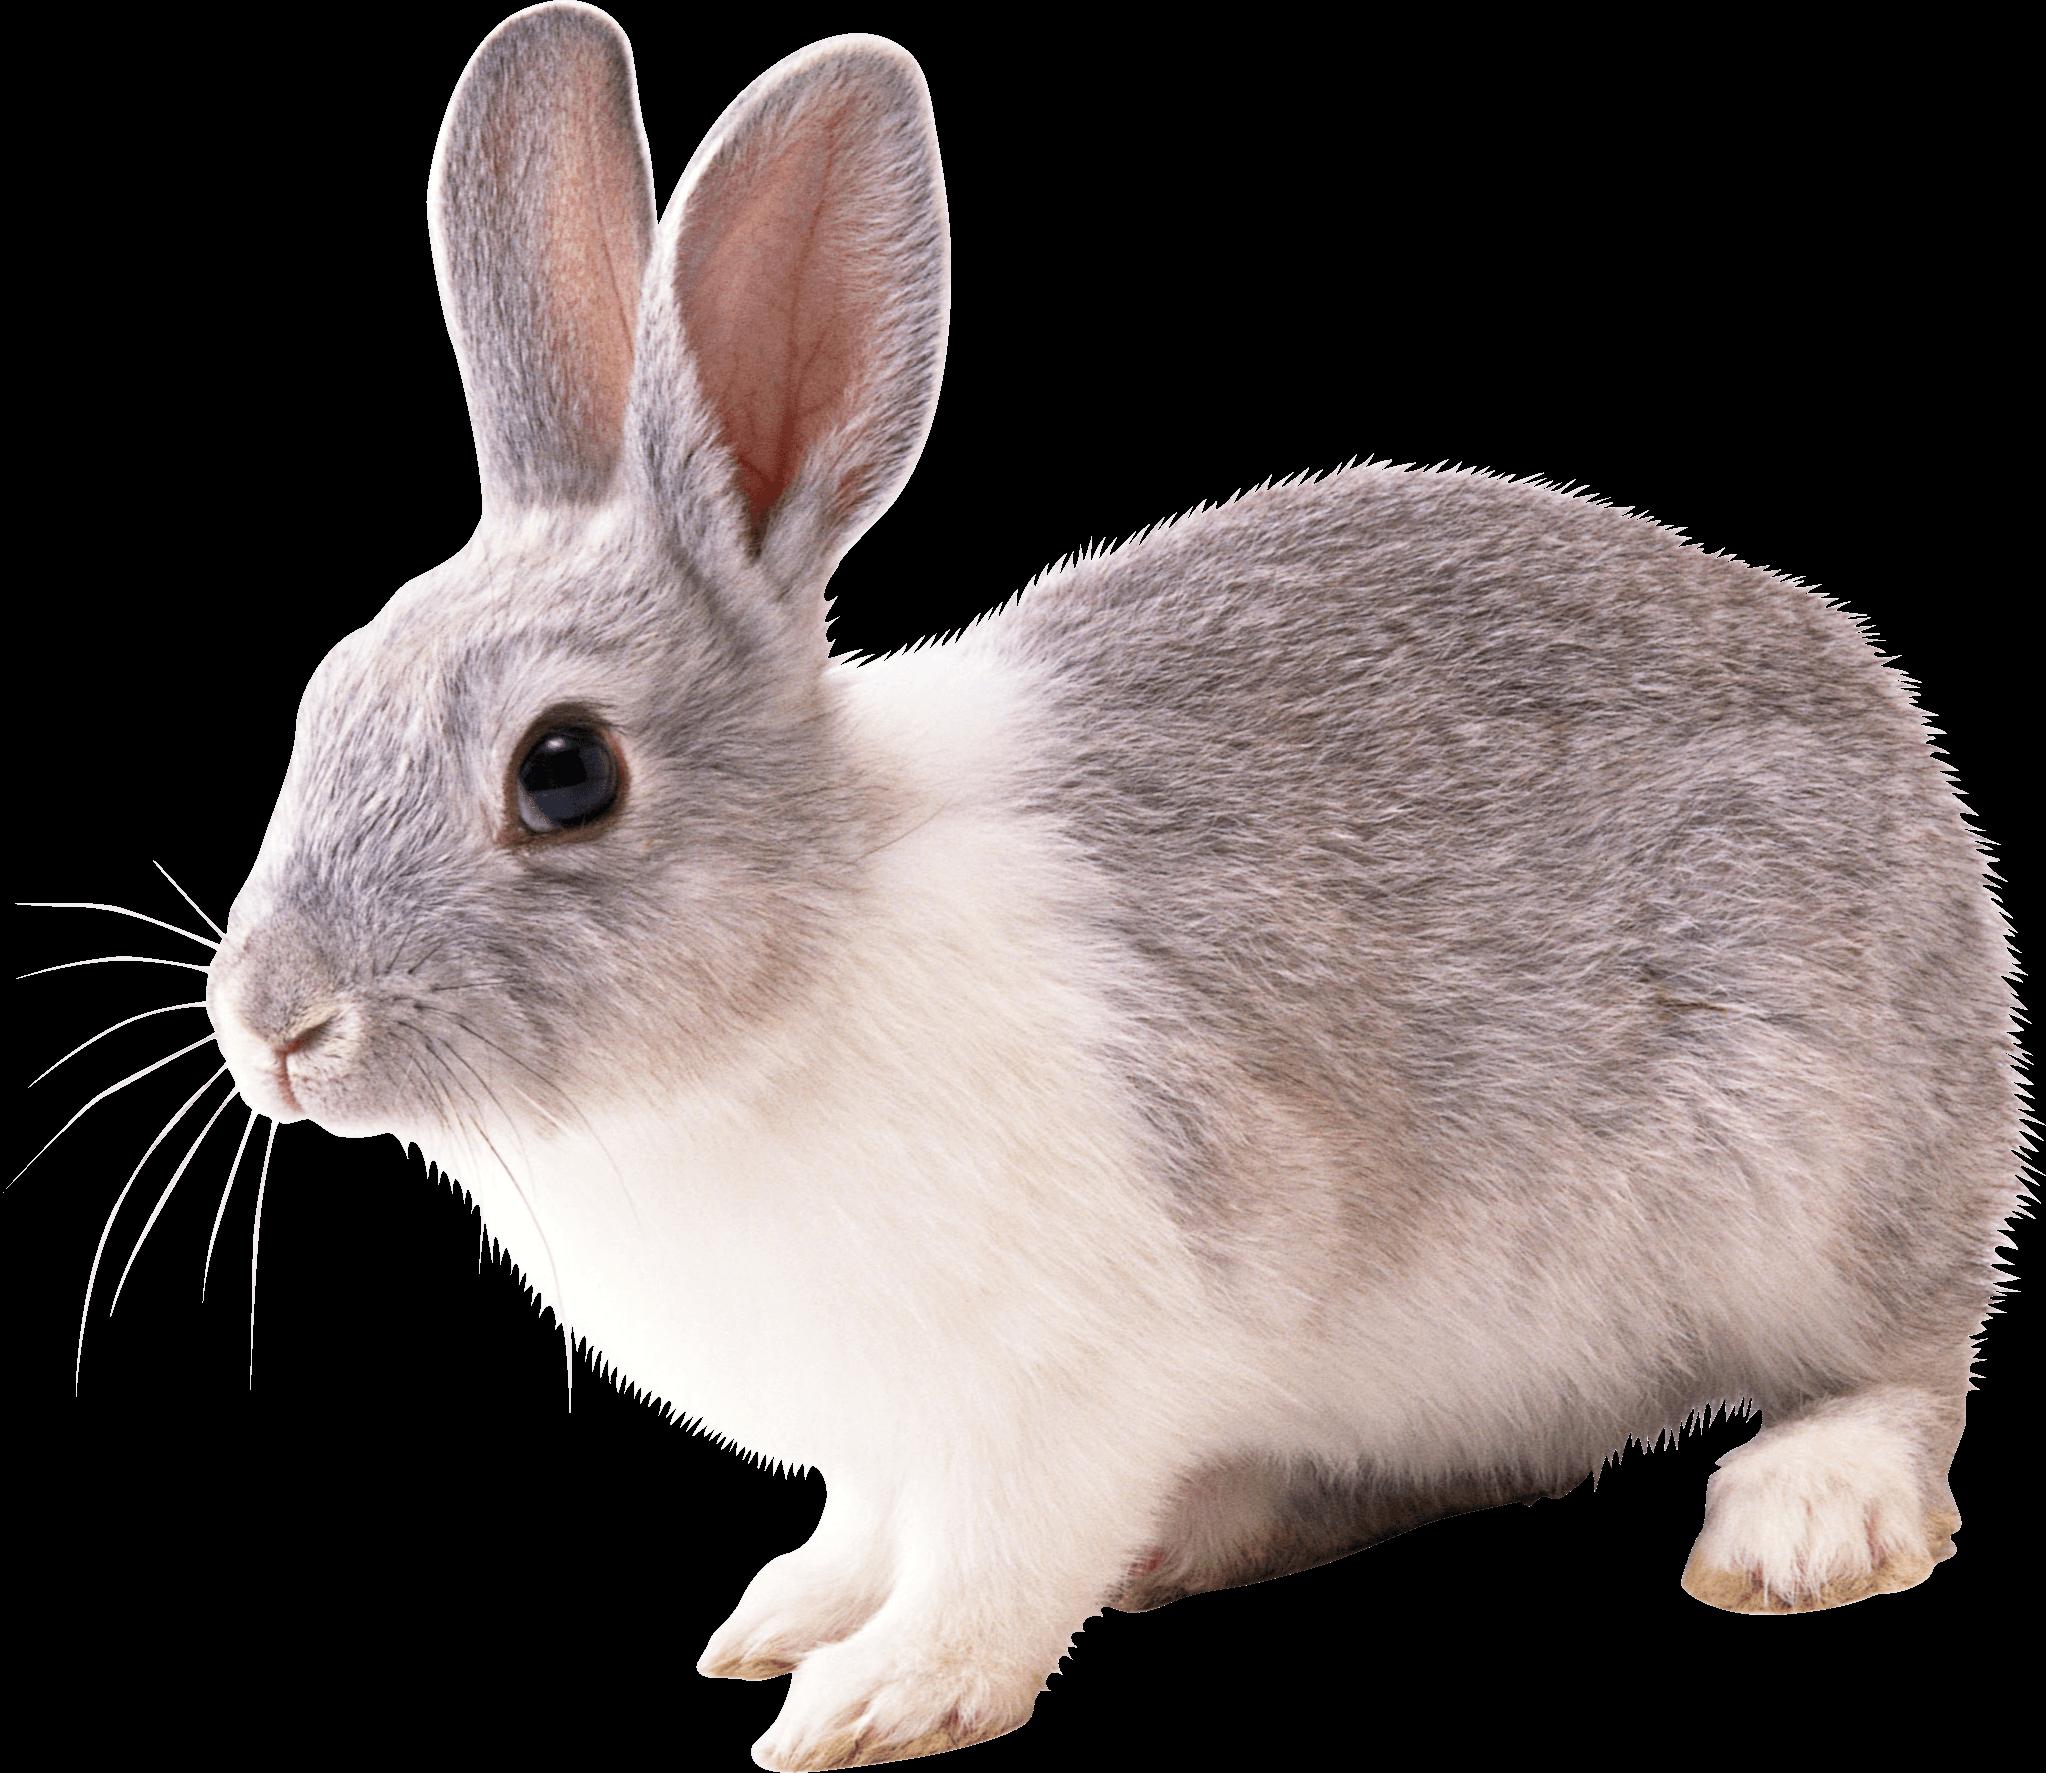 Rabbit Png Image Png Image - Rabbit, Transparent background PNG HD thumbnail